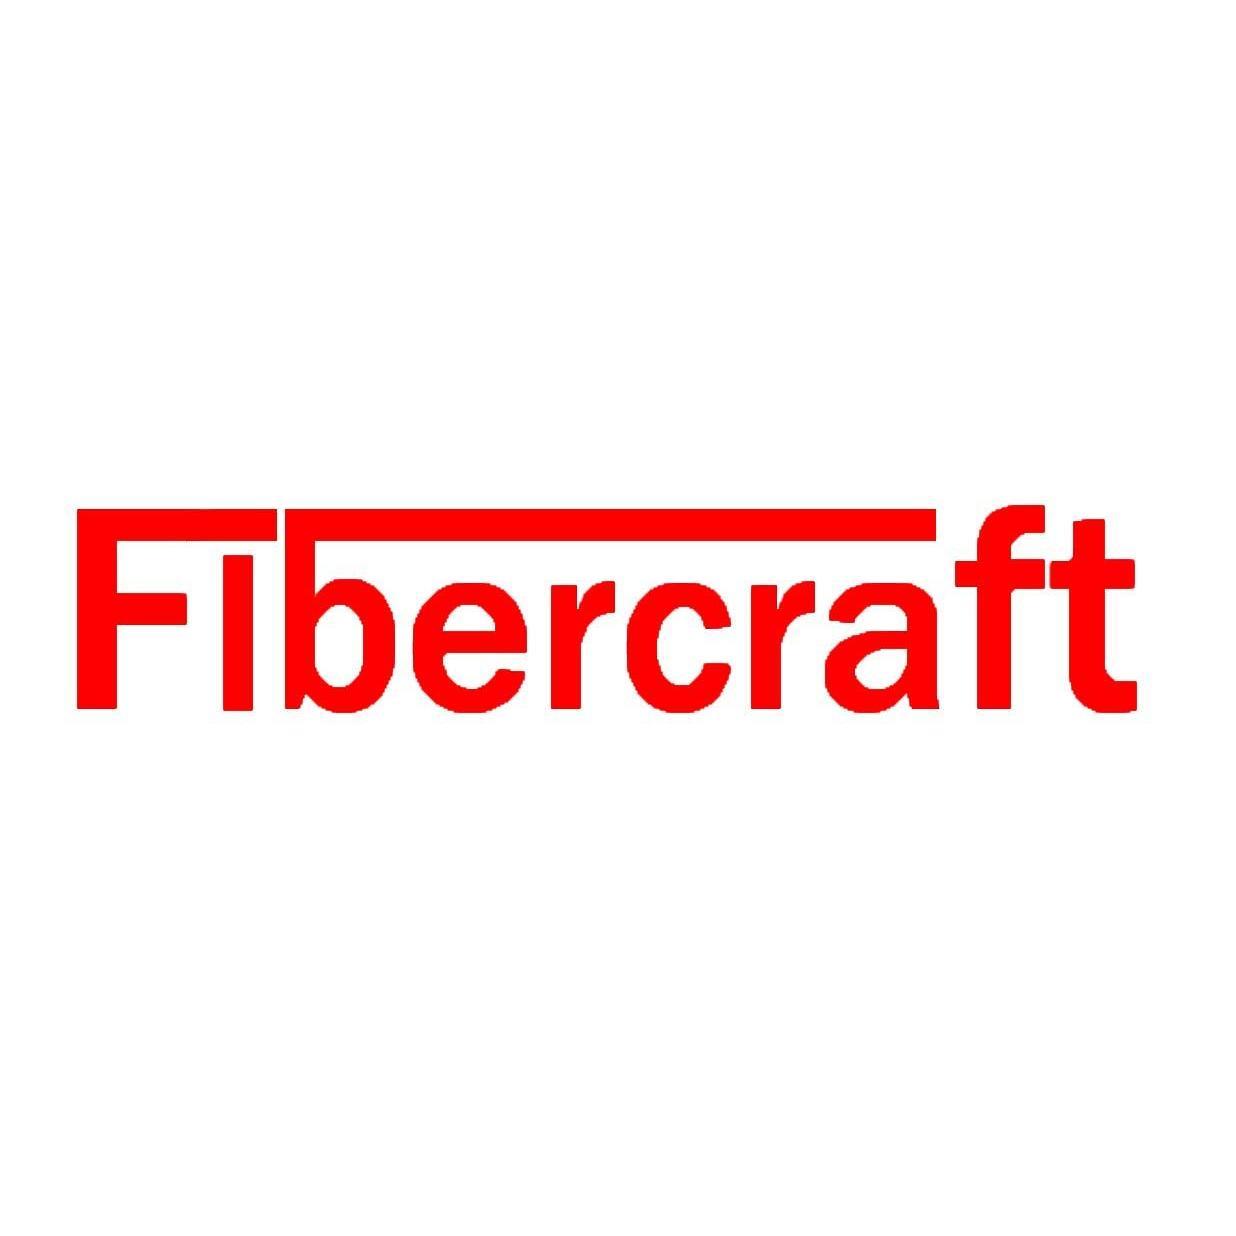 Fibercraft Inc